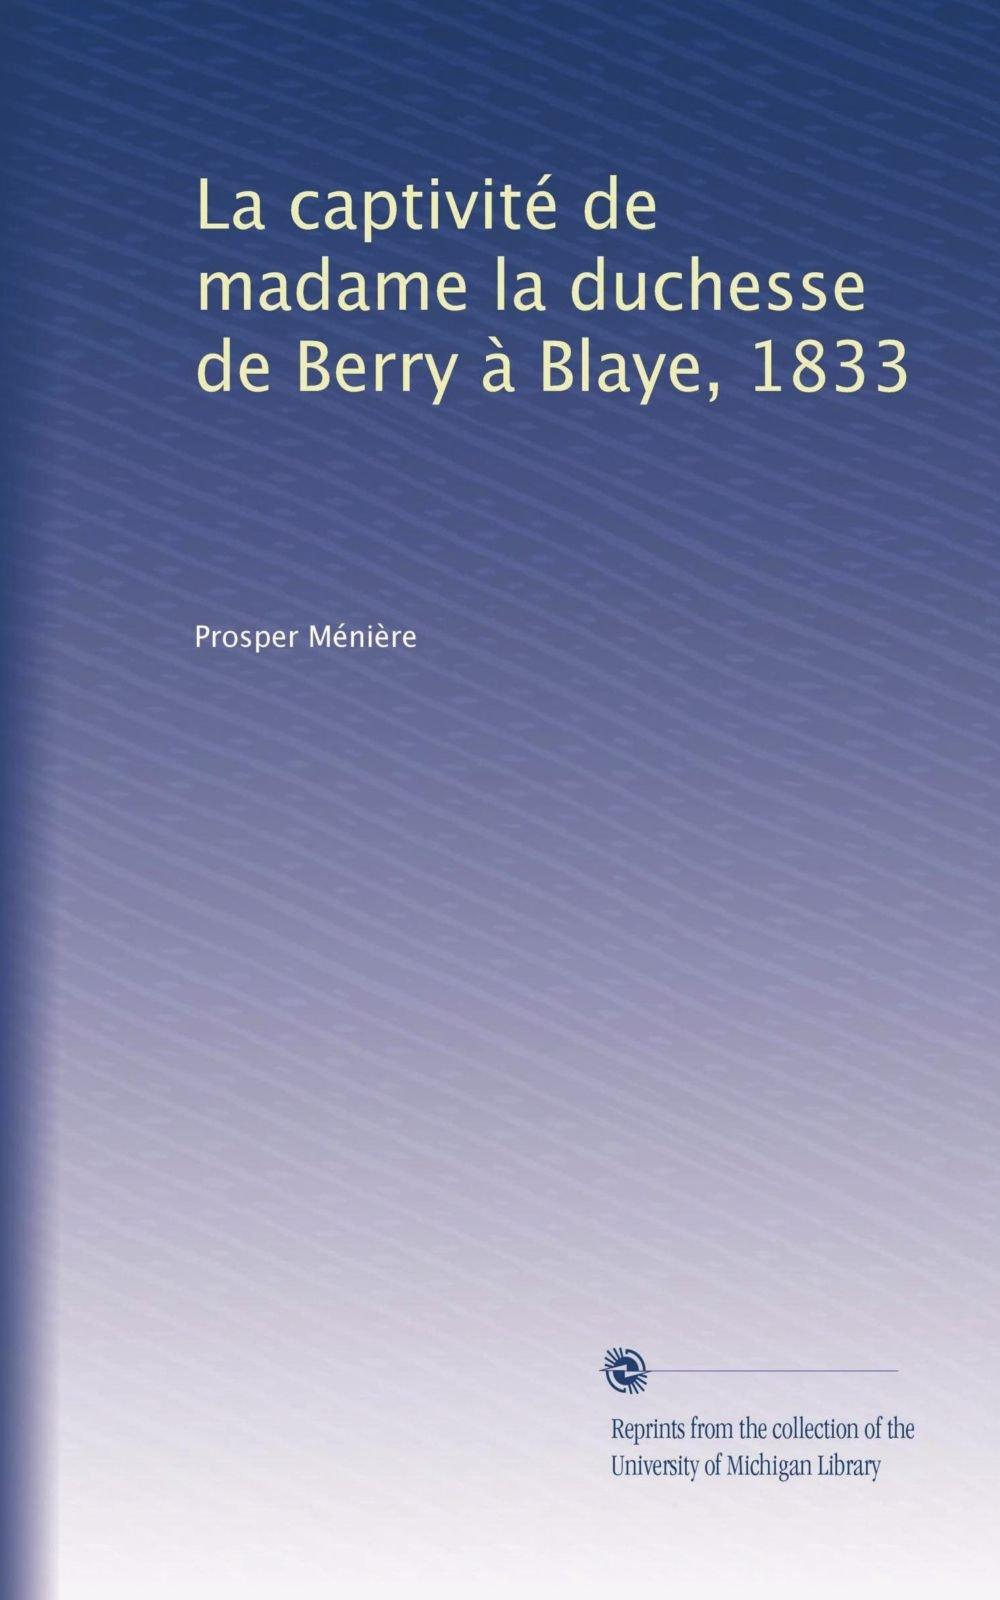 La Captivit De Madame Duchesse Berry Blaye 1833 French Edition Paperback January 1 1882